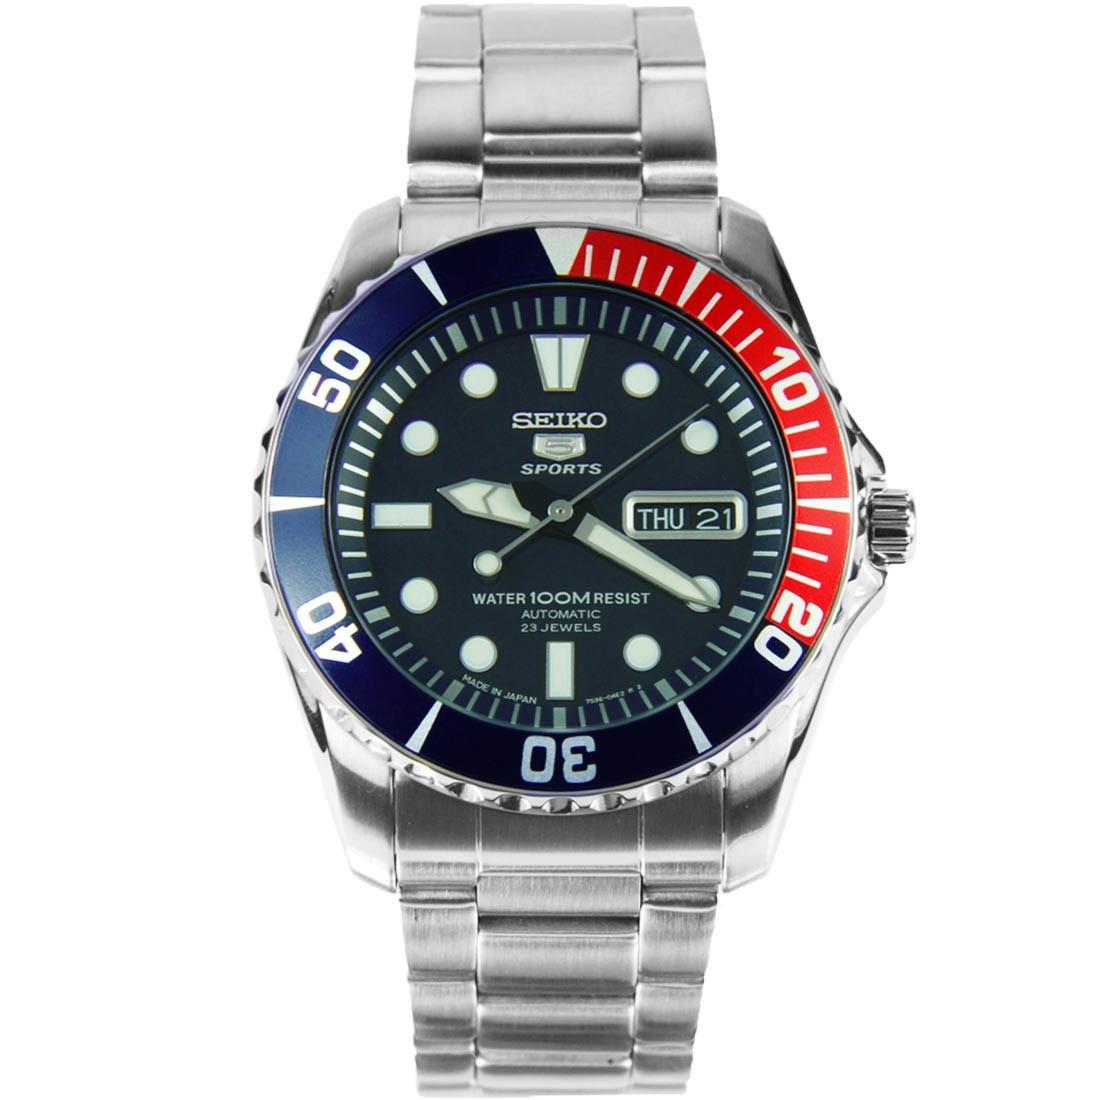 Часы Seiko SNZF15J1 Pepsi Automatic 7S36